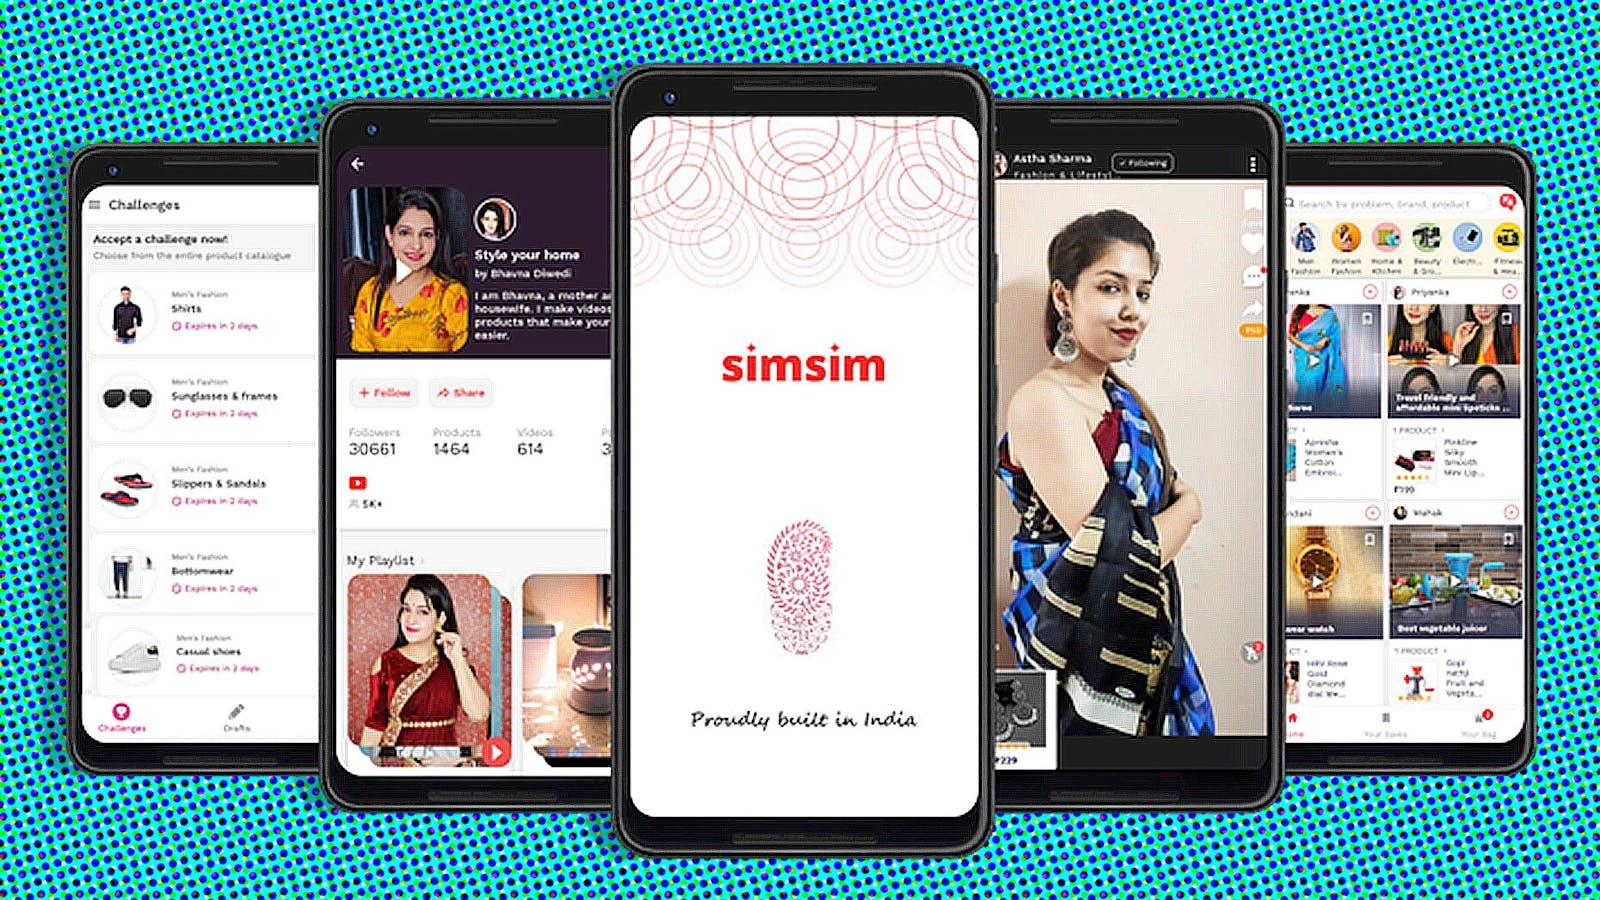 Photos of Simsim, courtesy of the company.